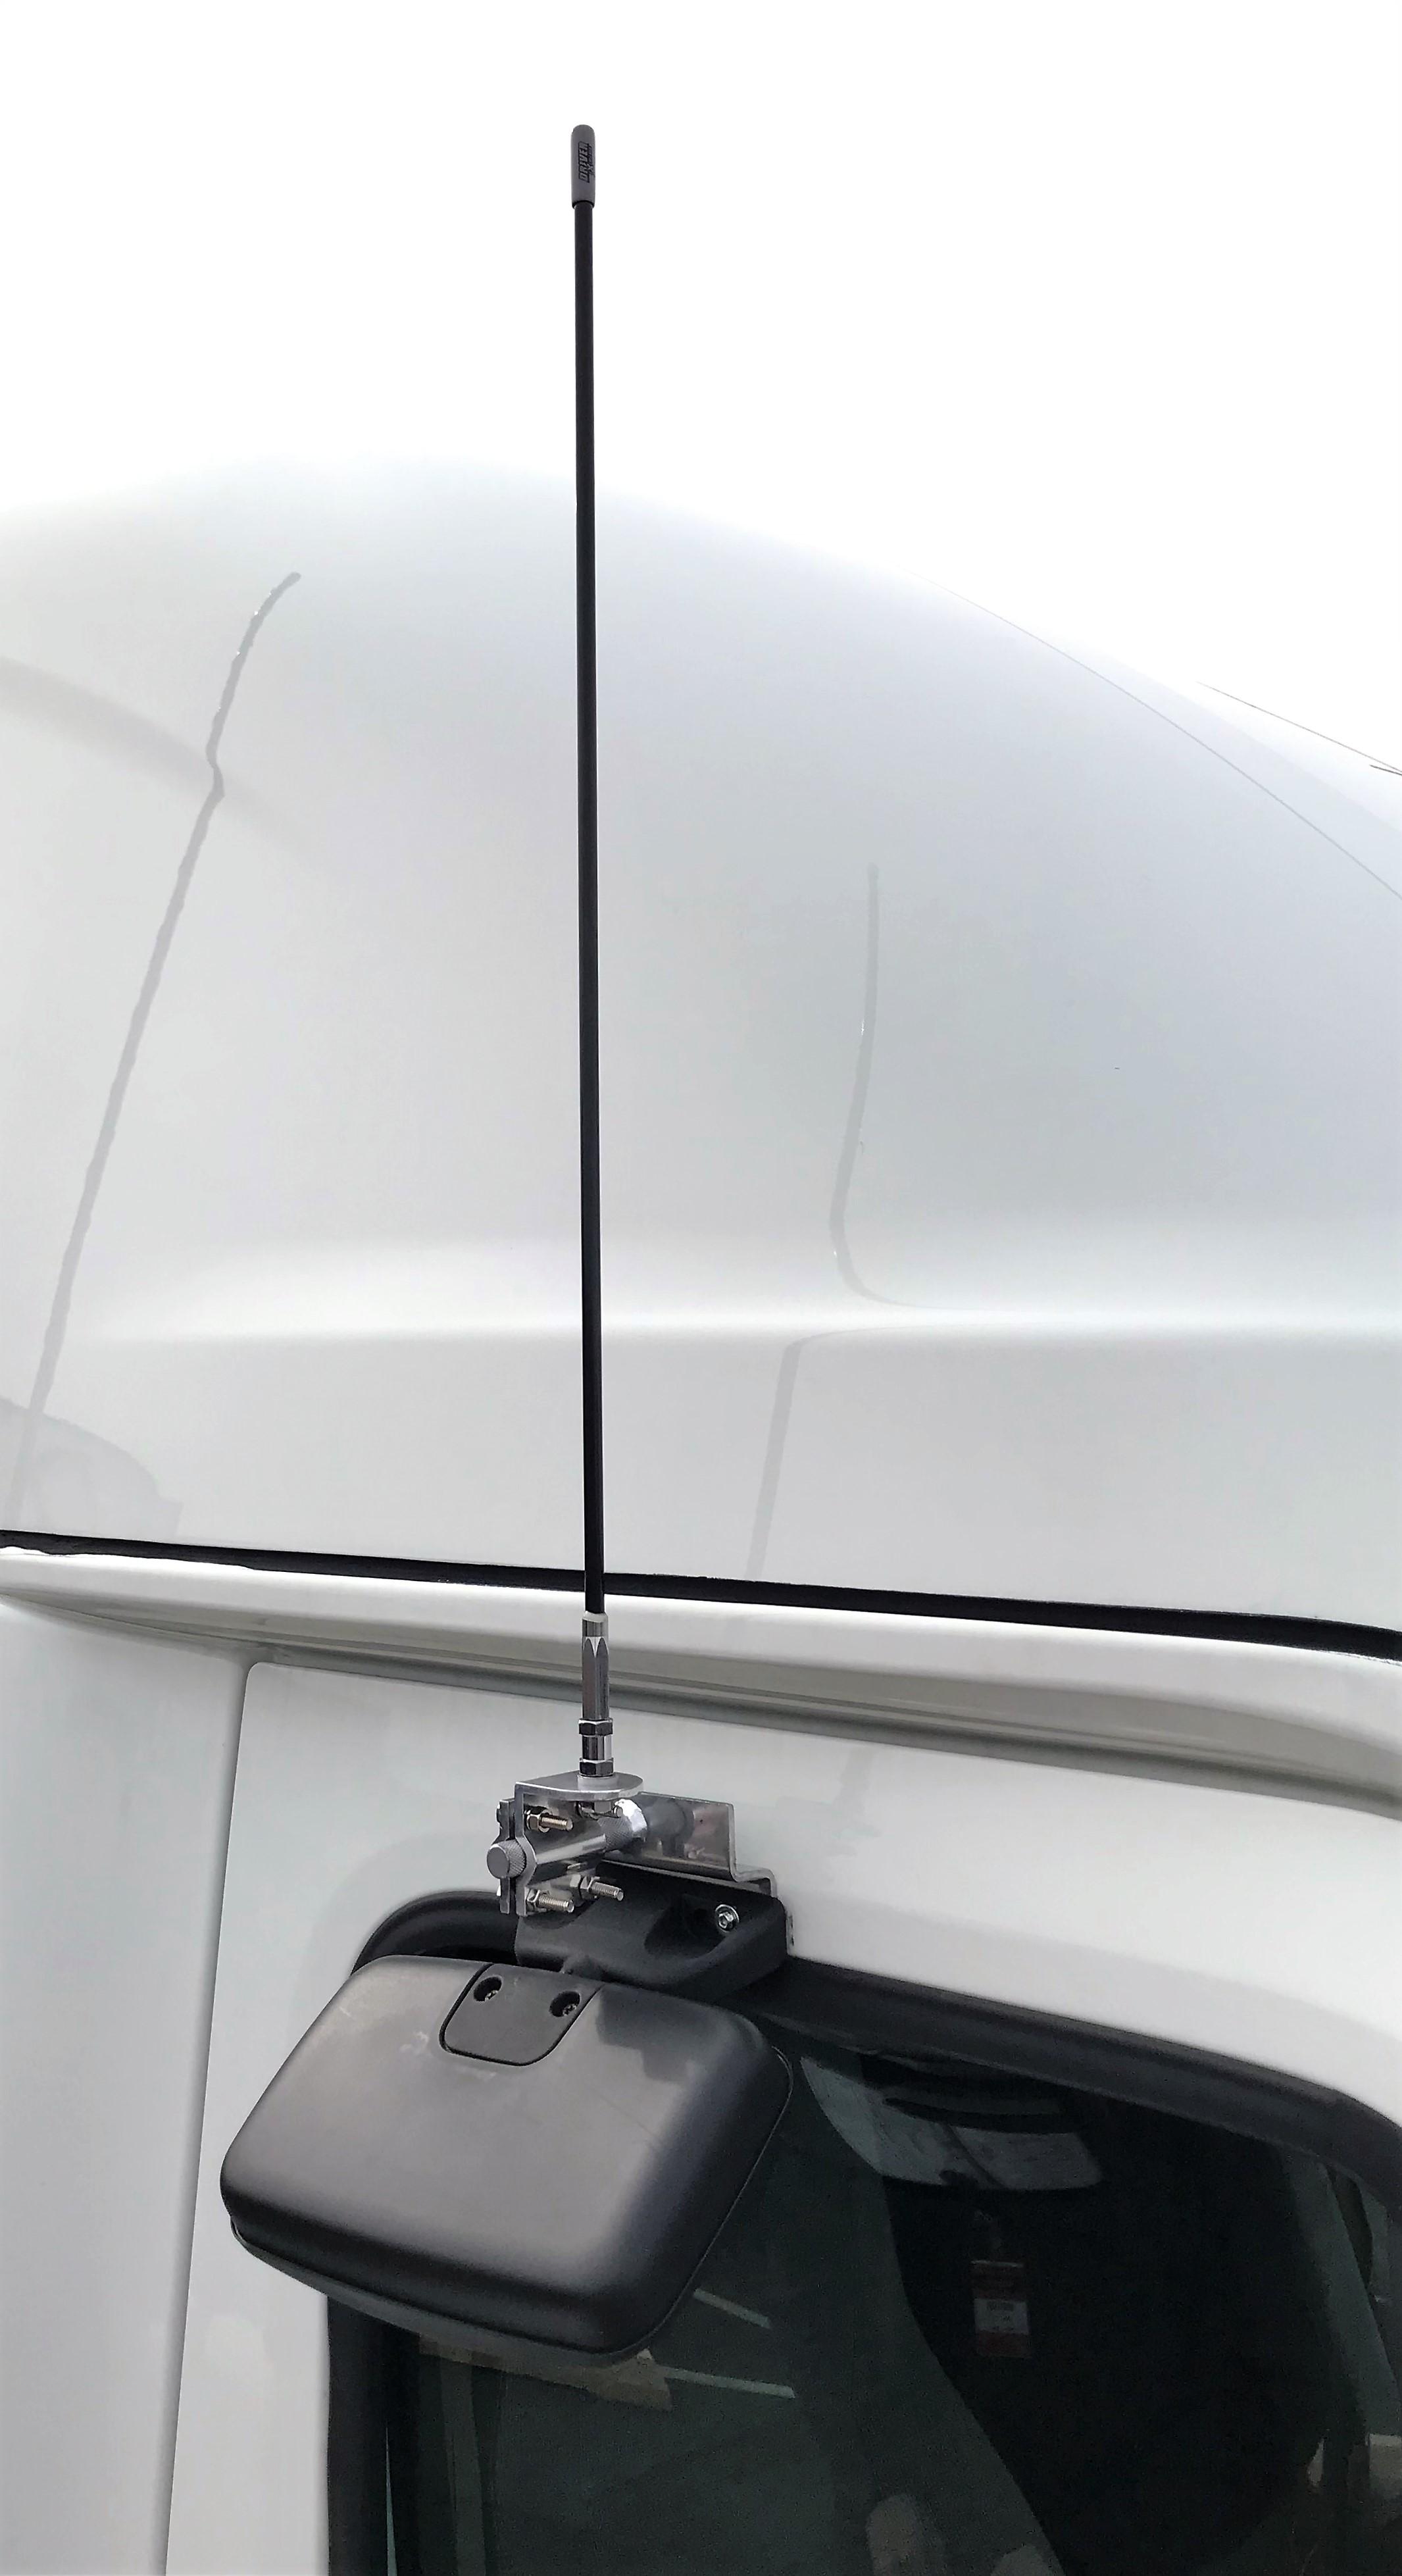 PCA60 - ProComm Spot Mirror Location Antenna Mounting Bar Bracket